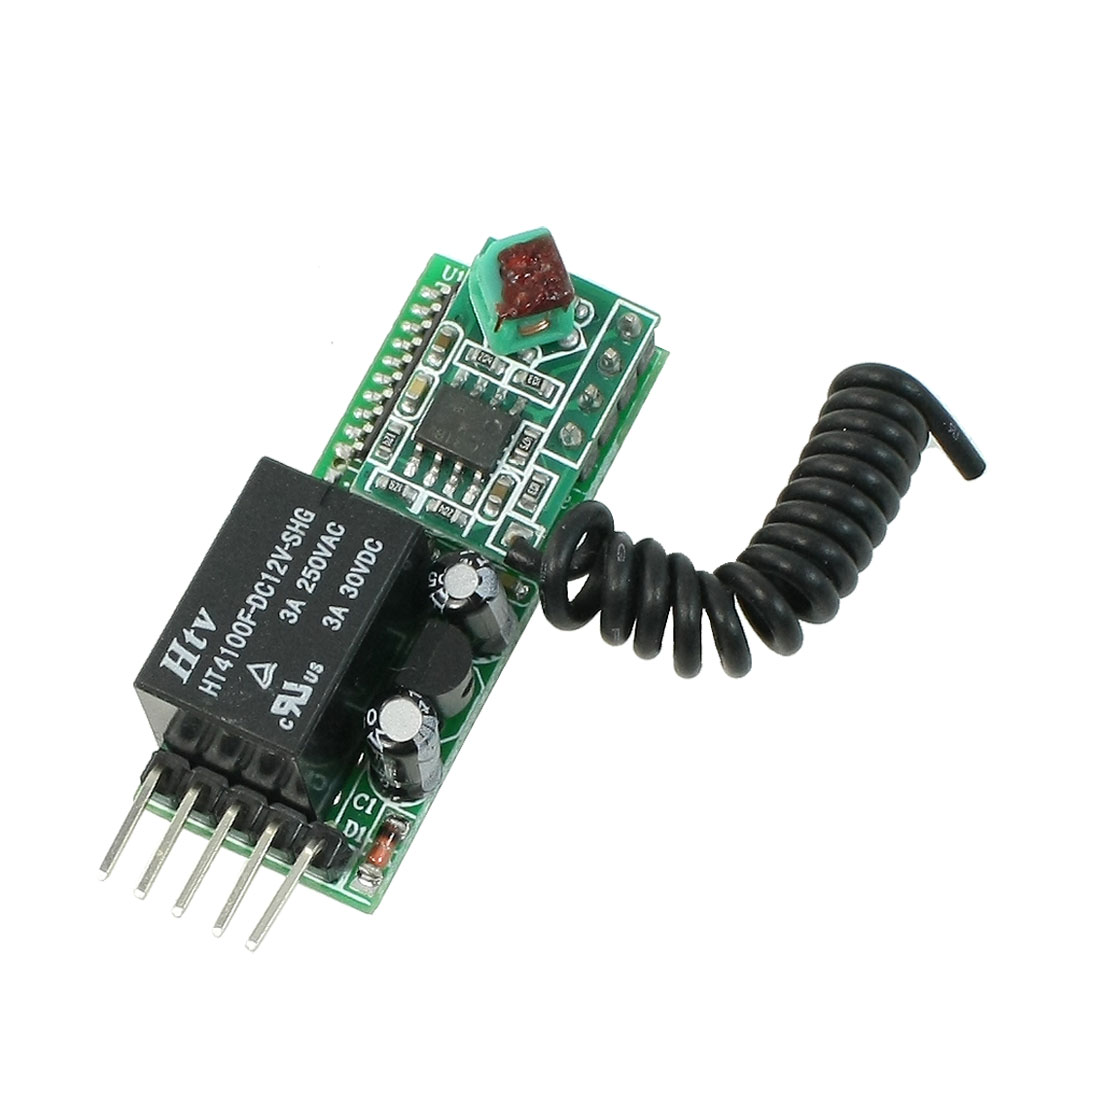 DC12V 325M Energy-saving Single Way Wireless Remote Control Module